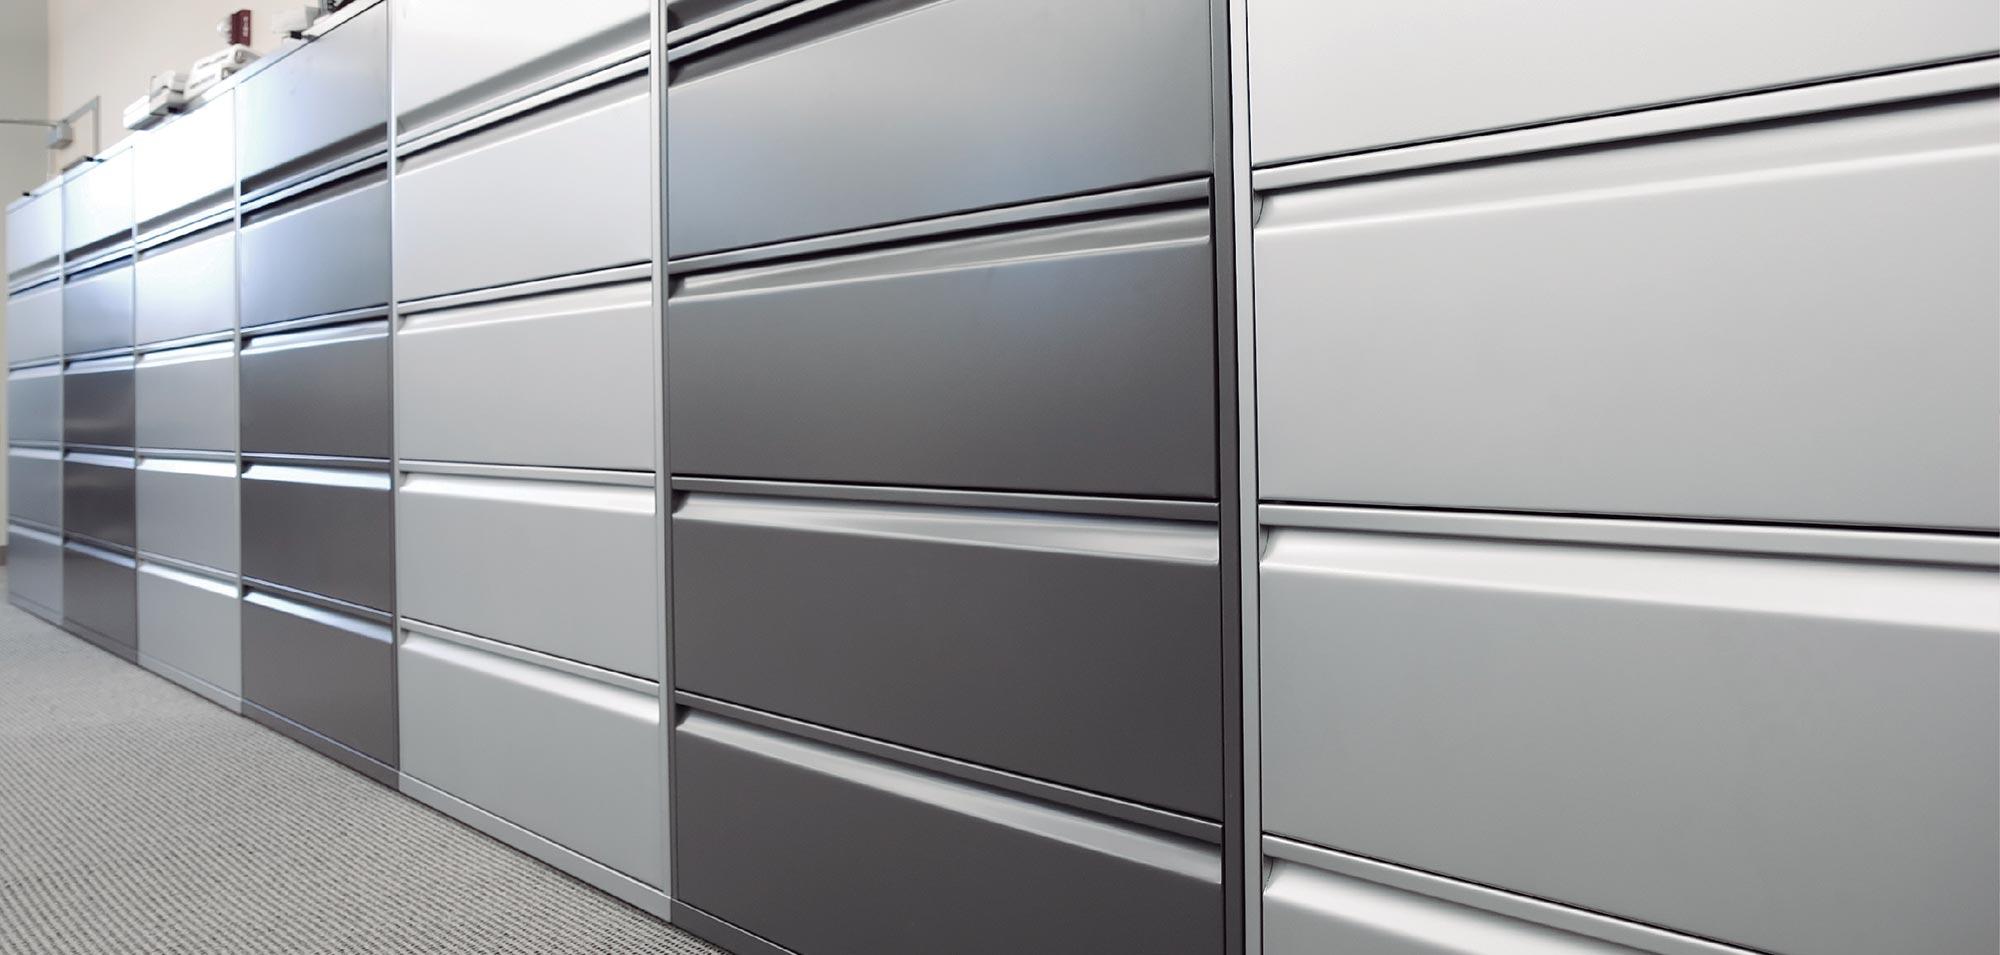 Estanterias Metalicas Oficina.Muebles De Oficina Medellin Muebles Metalicos Para Oficina